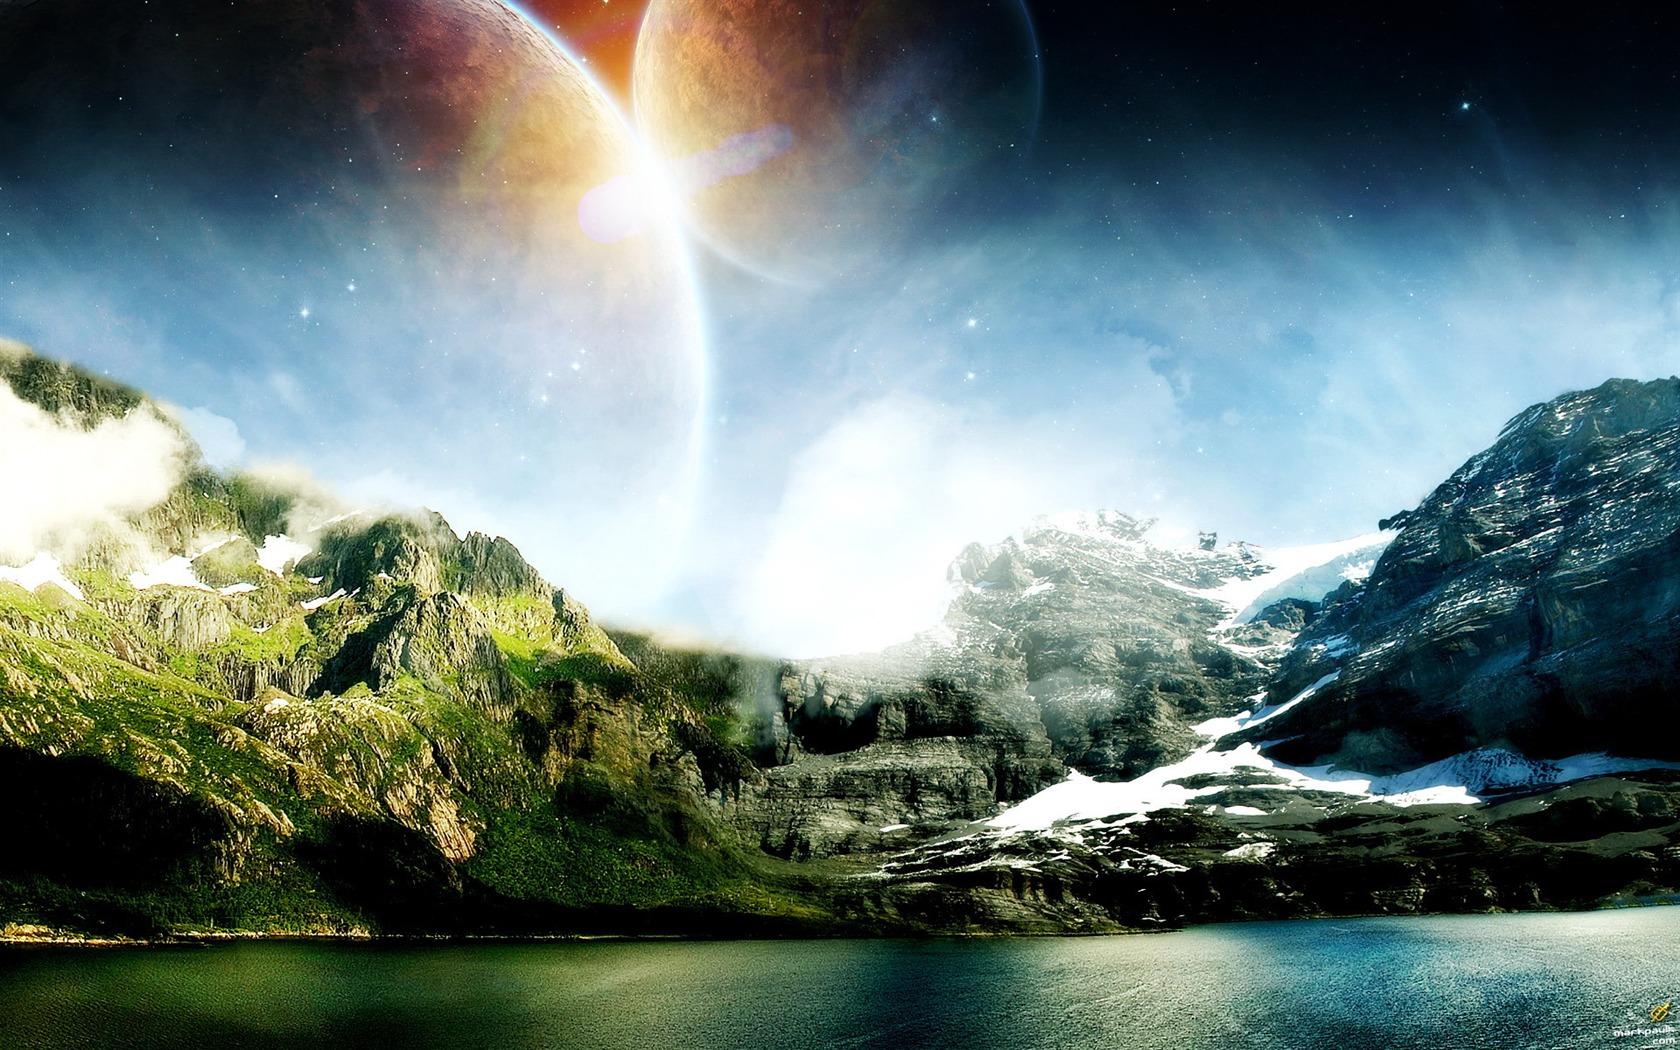 HD Widescreen Wallpapers Landscape #27